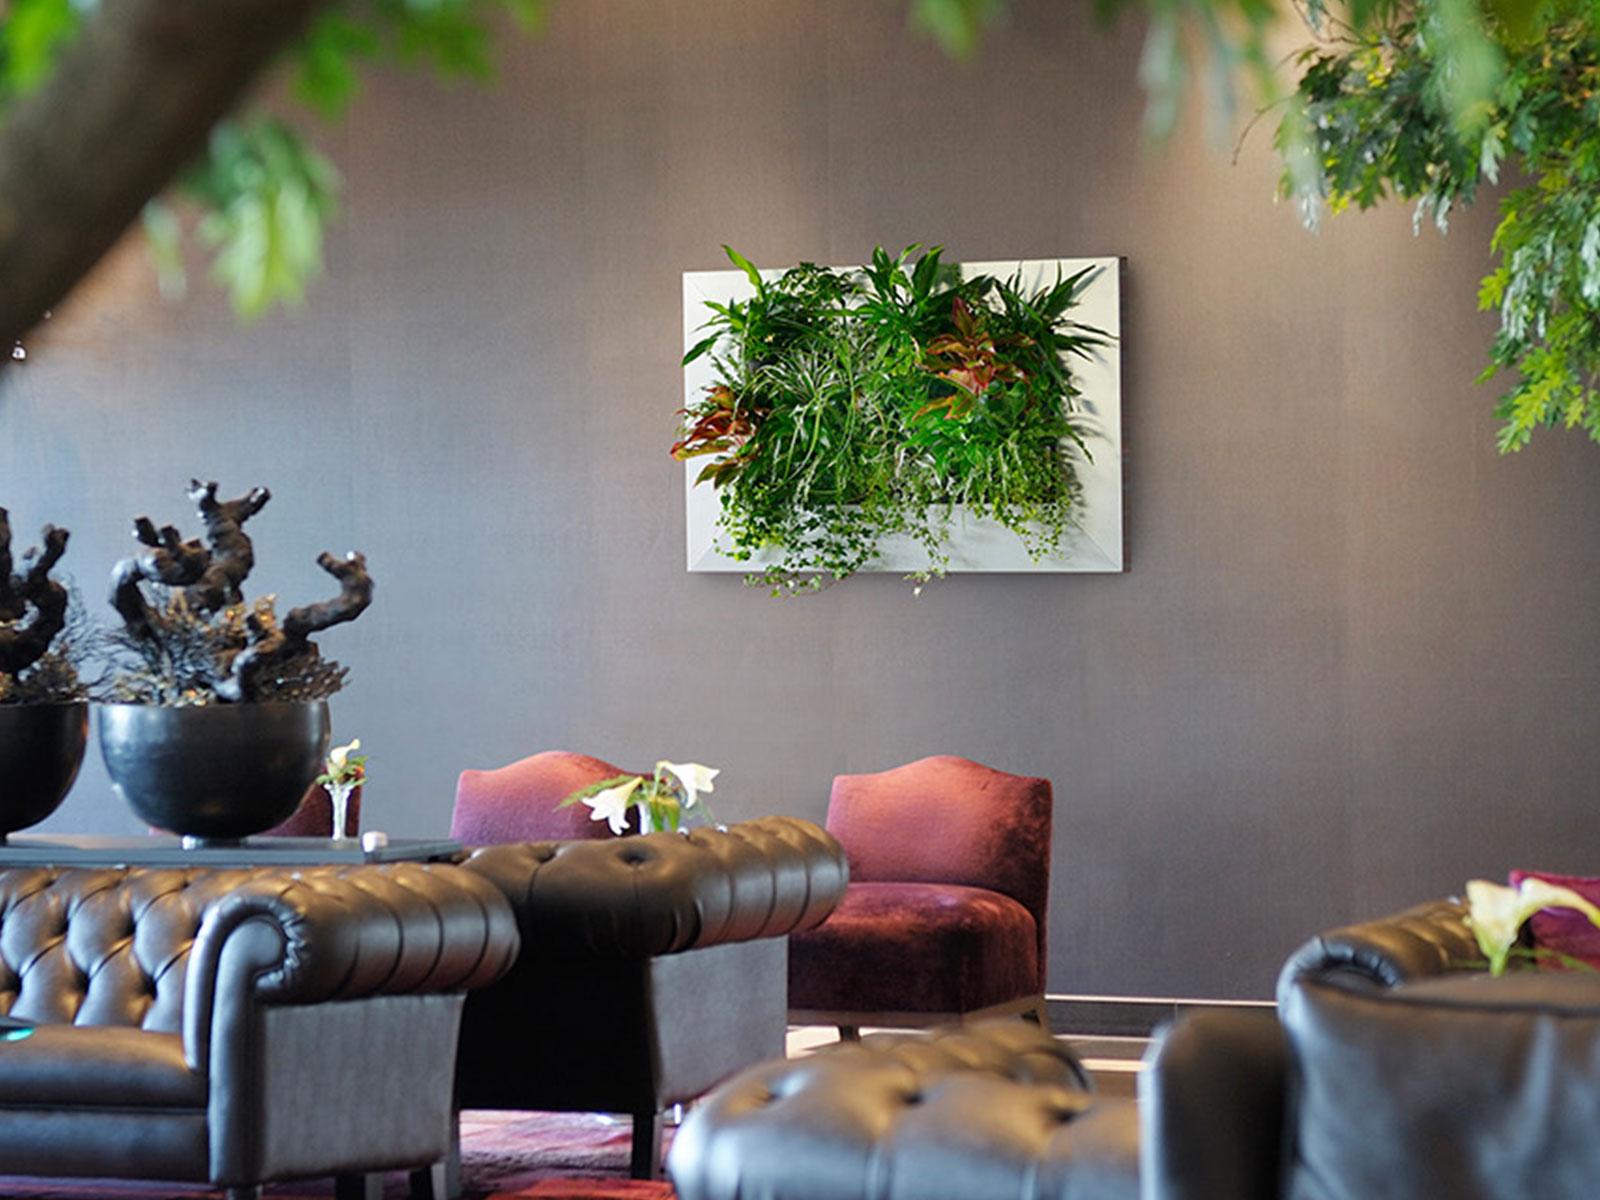 Wandbegrünung Innen Selber Machen pflanzenbilder hydroflora kleinode im grünen kleid